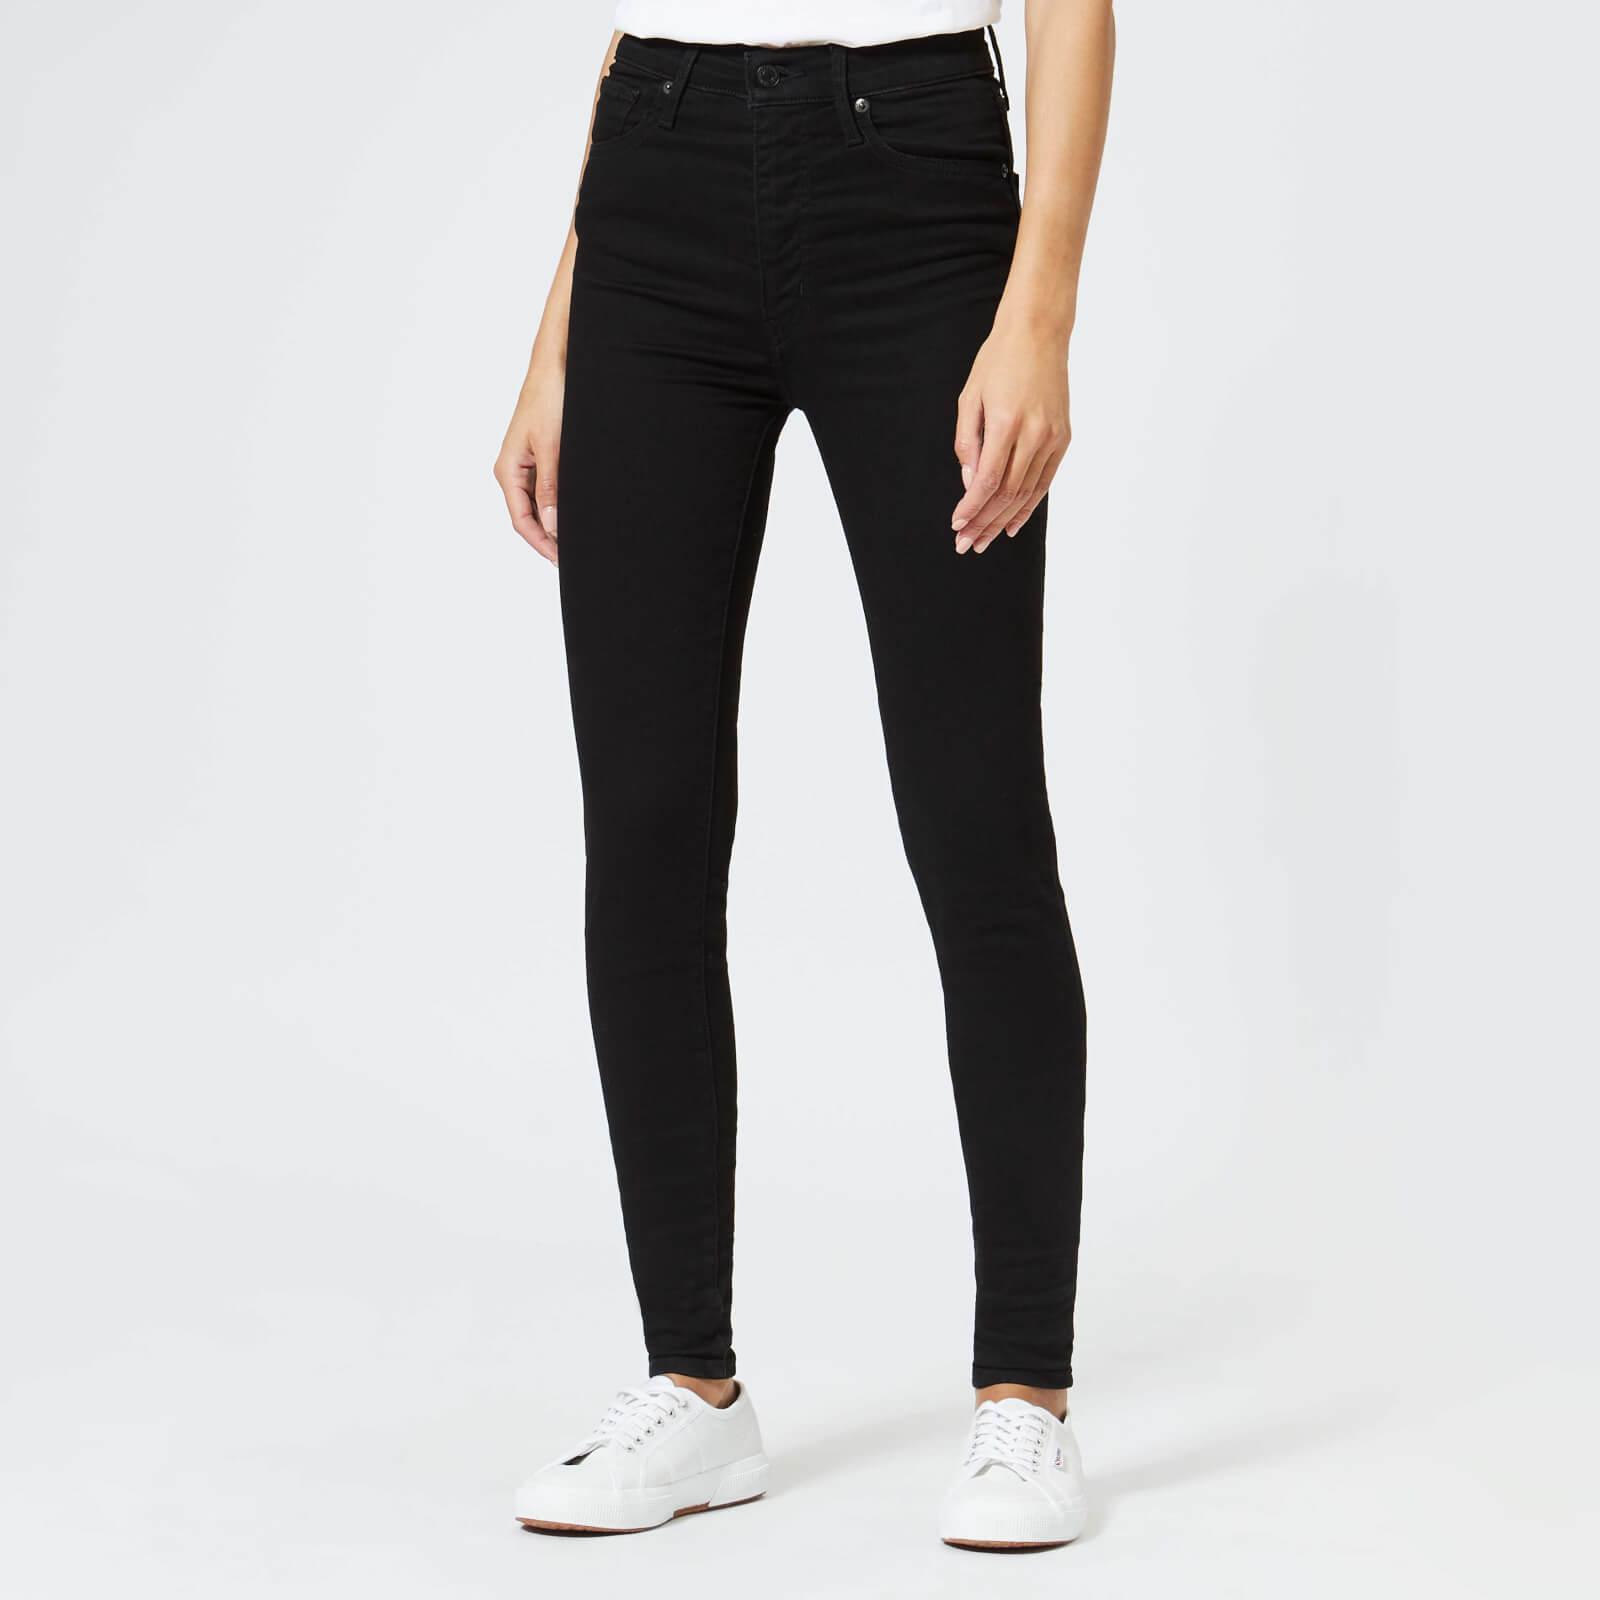 Levi's s Mile High Super Skinny Jeans - Black Galaxy - W27/L30